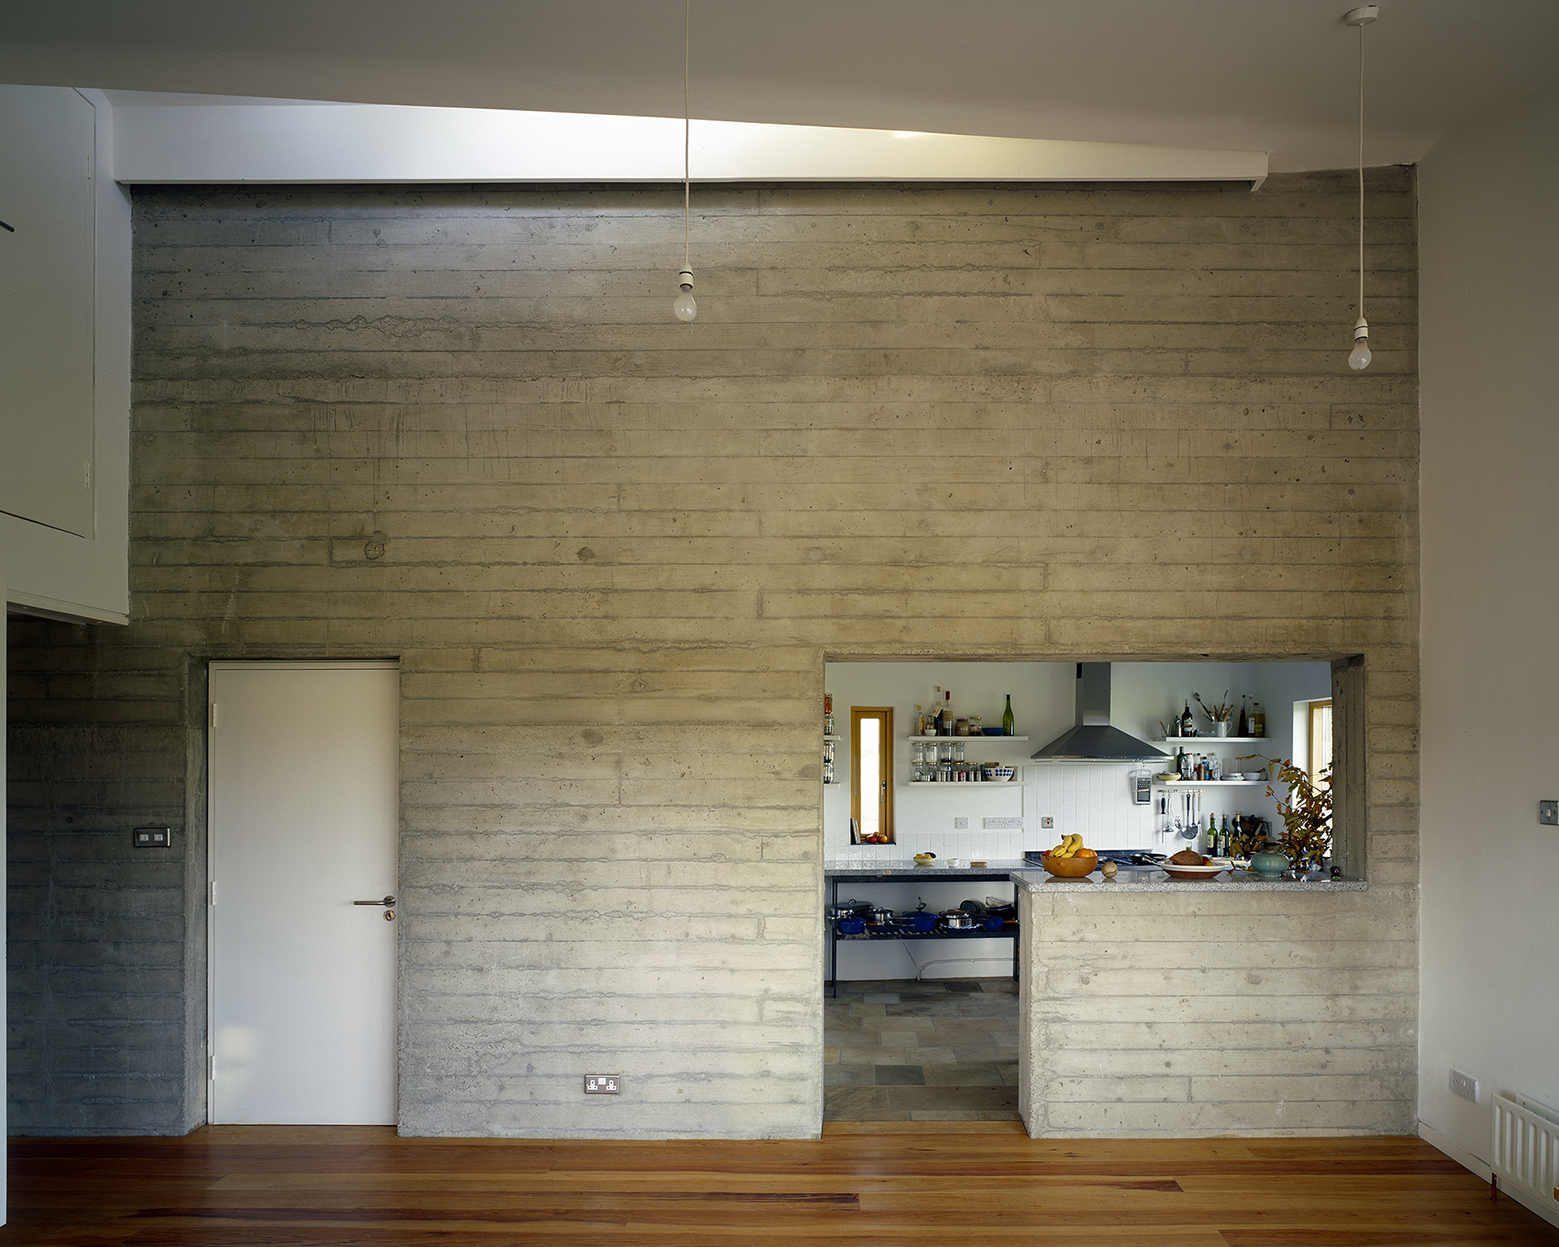 Carton Levert de Macgabhann Architects